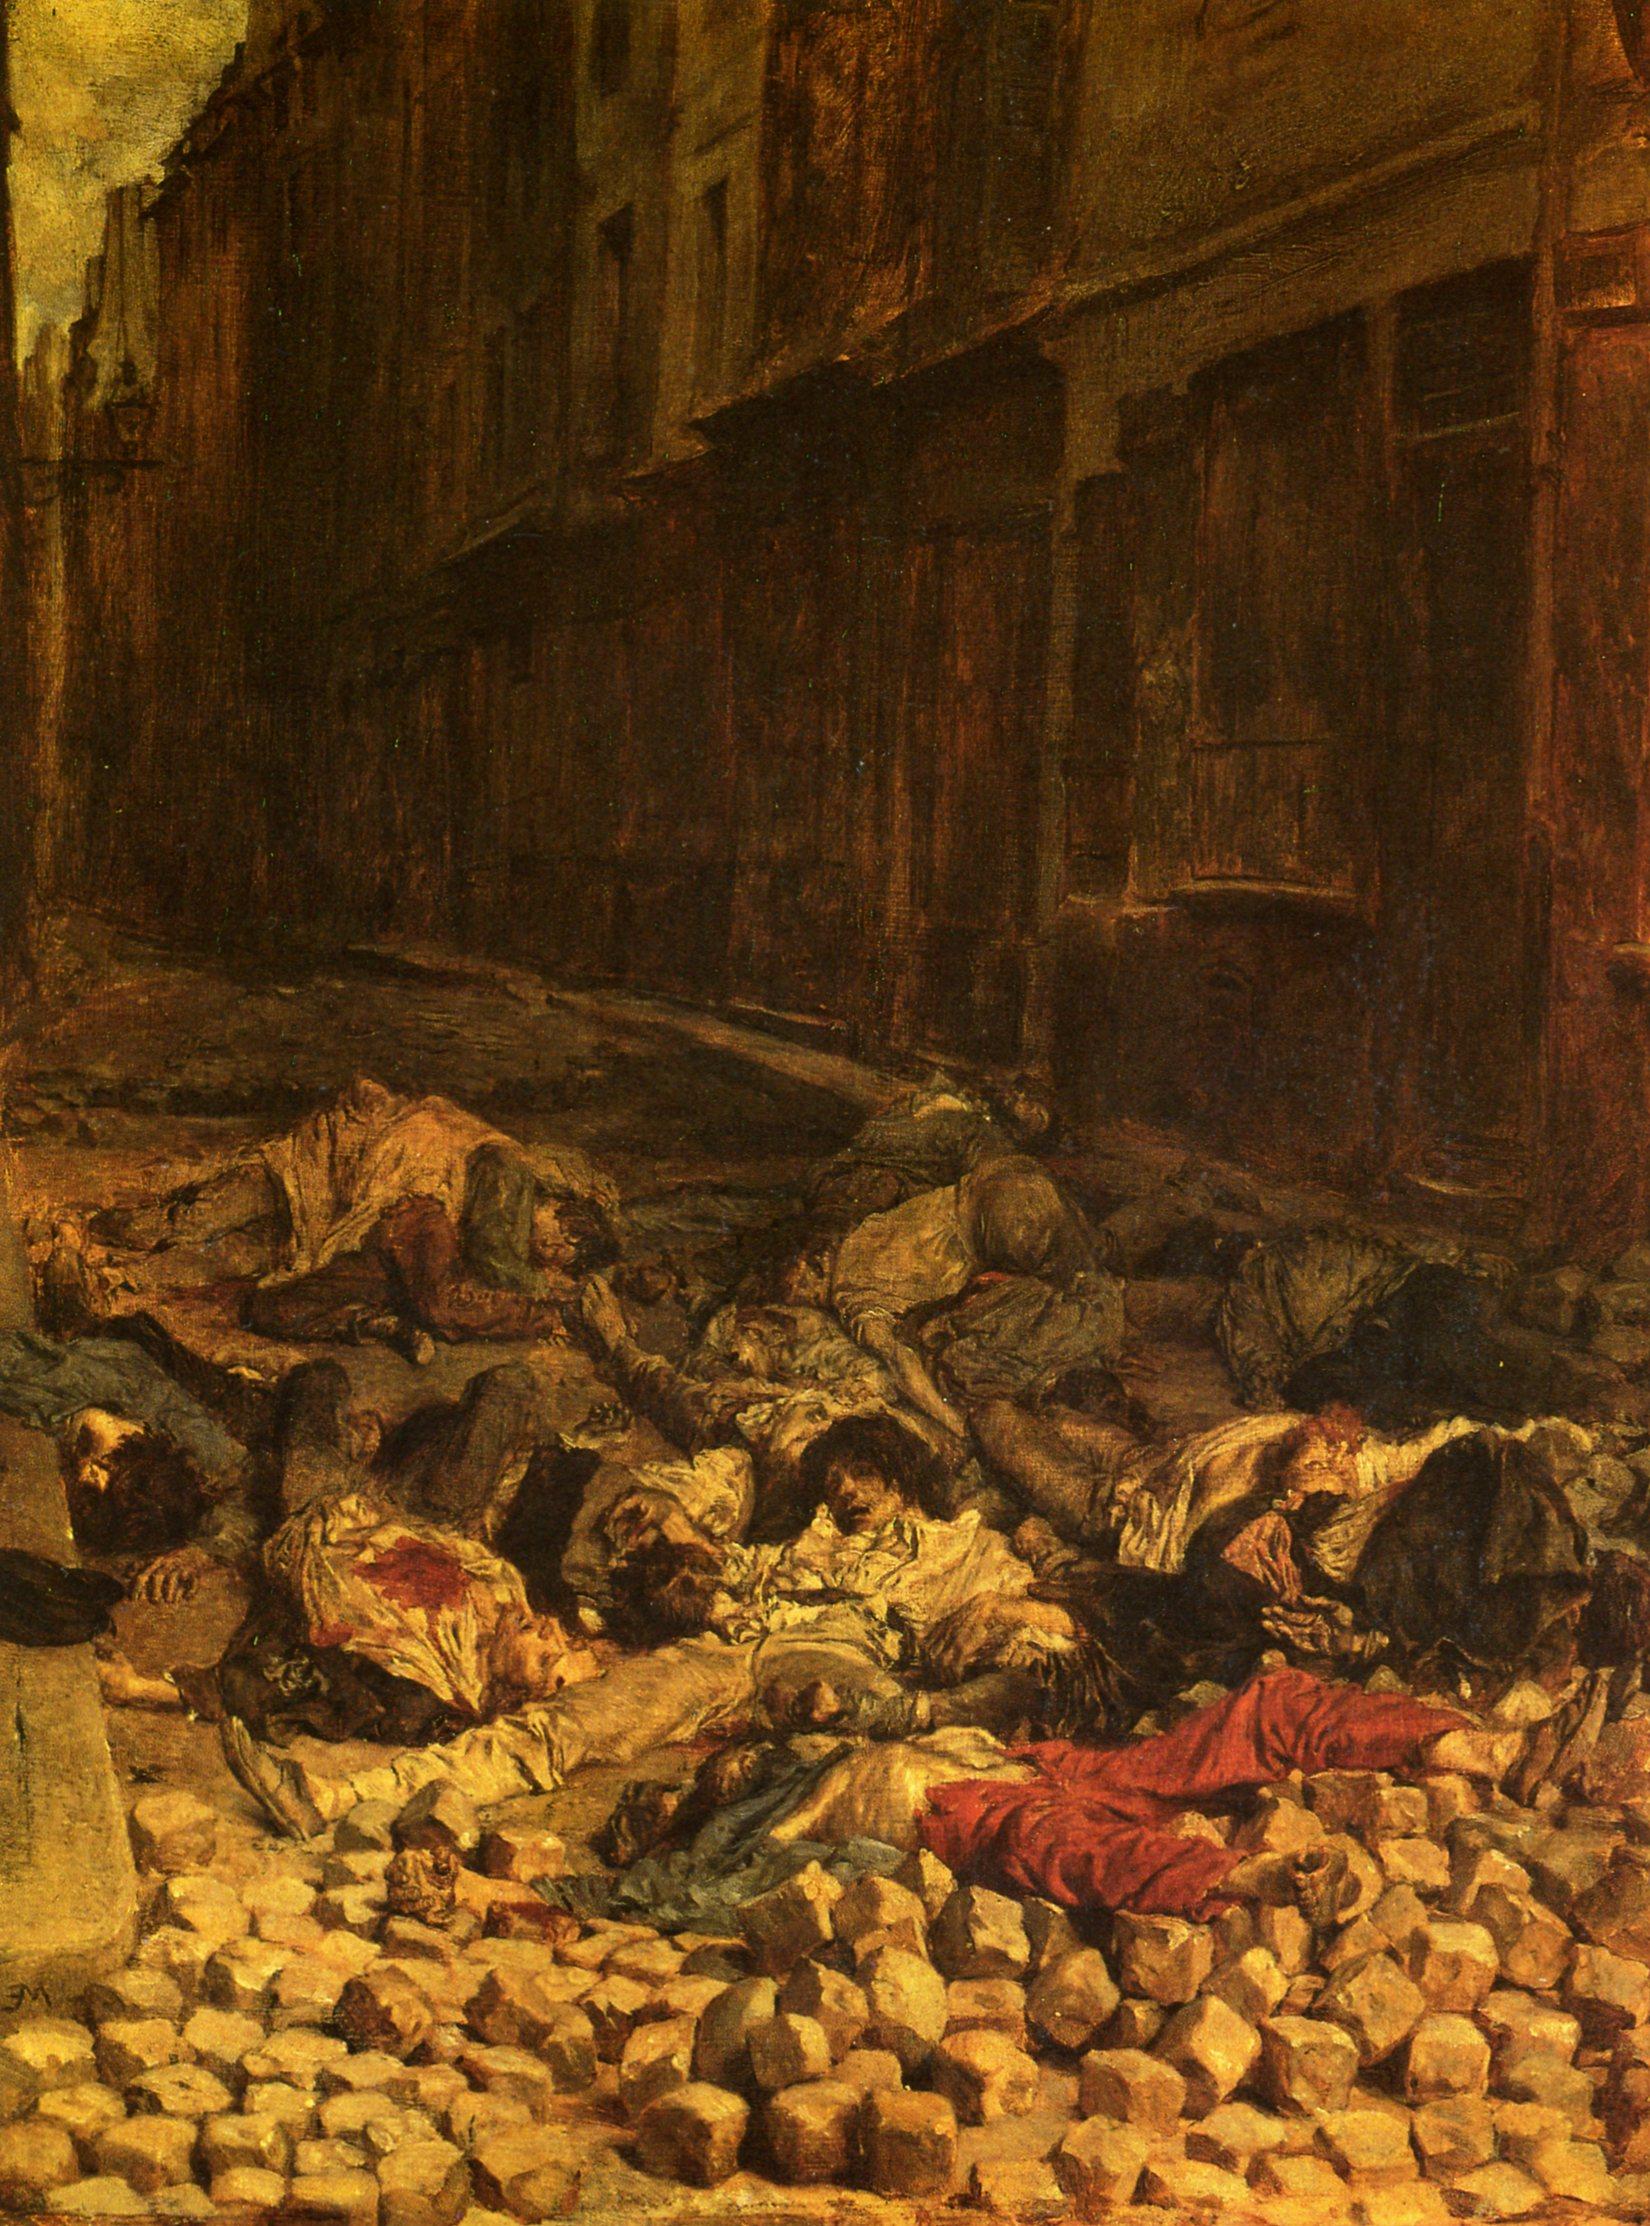 1848-meissonier-ernest-la-barricade